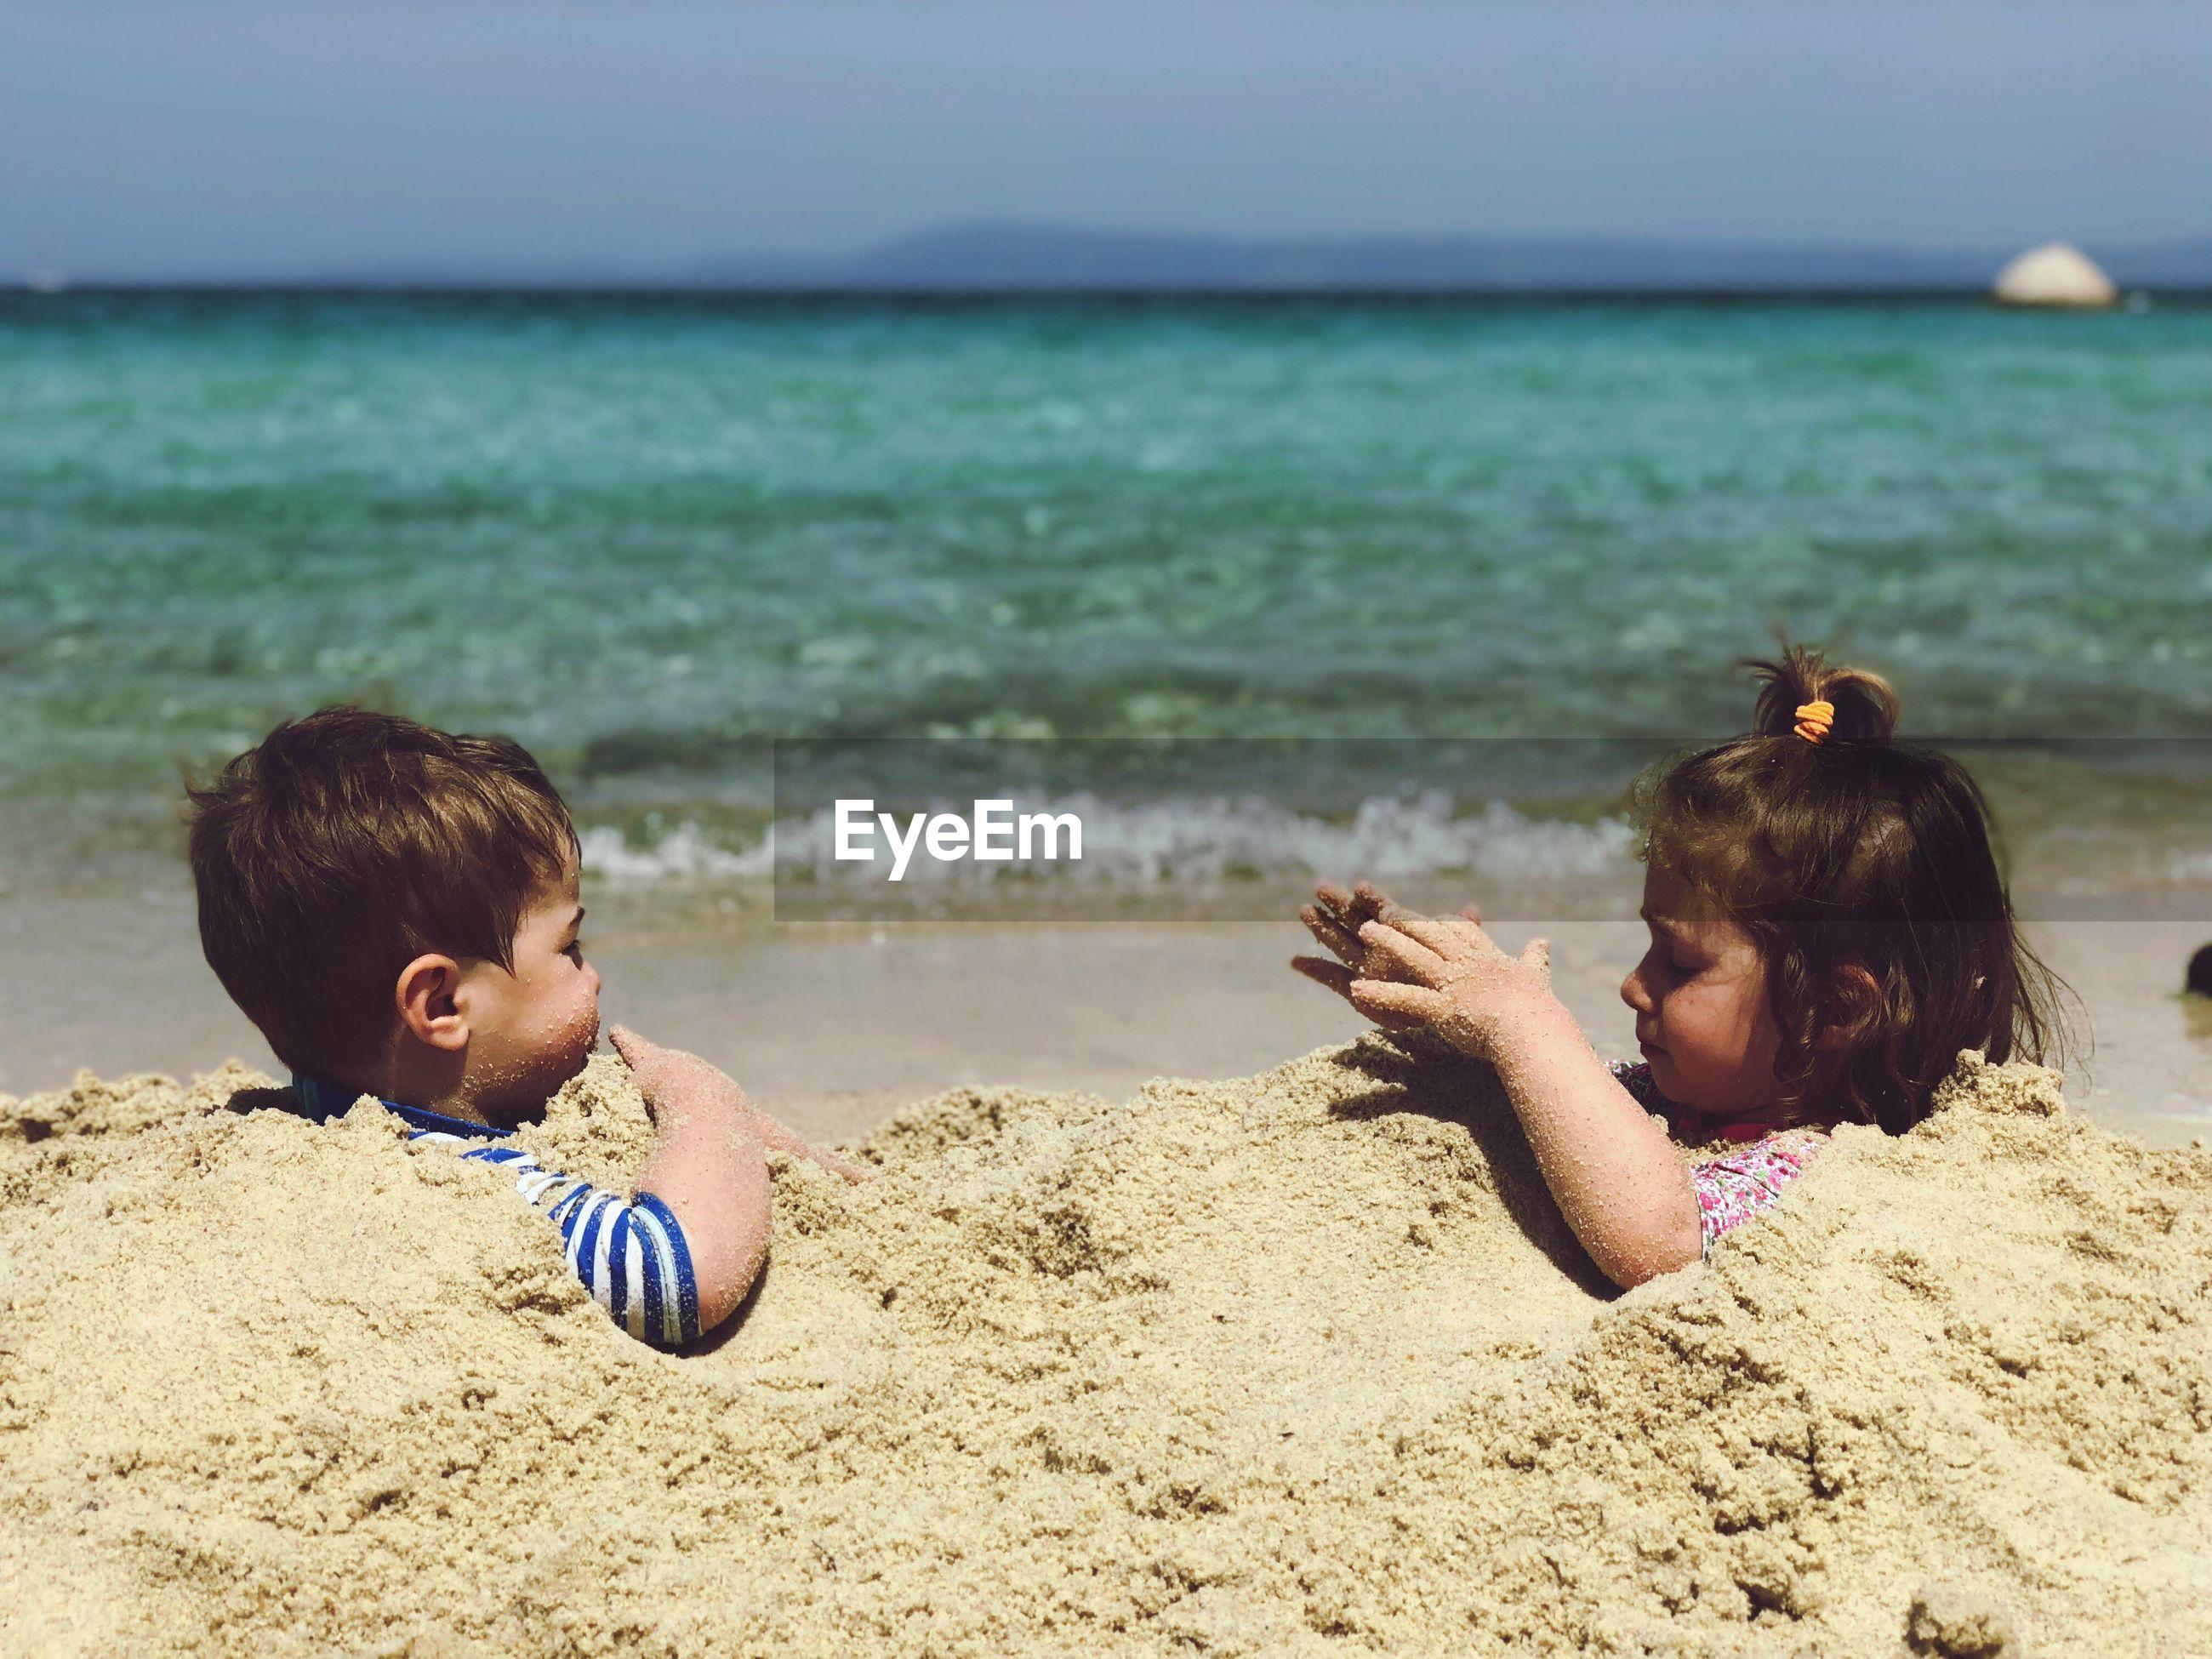 Playful children in sand at beach during summer